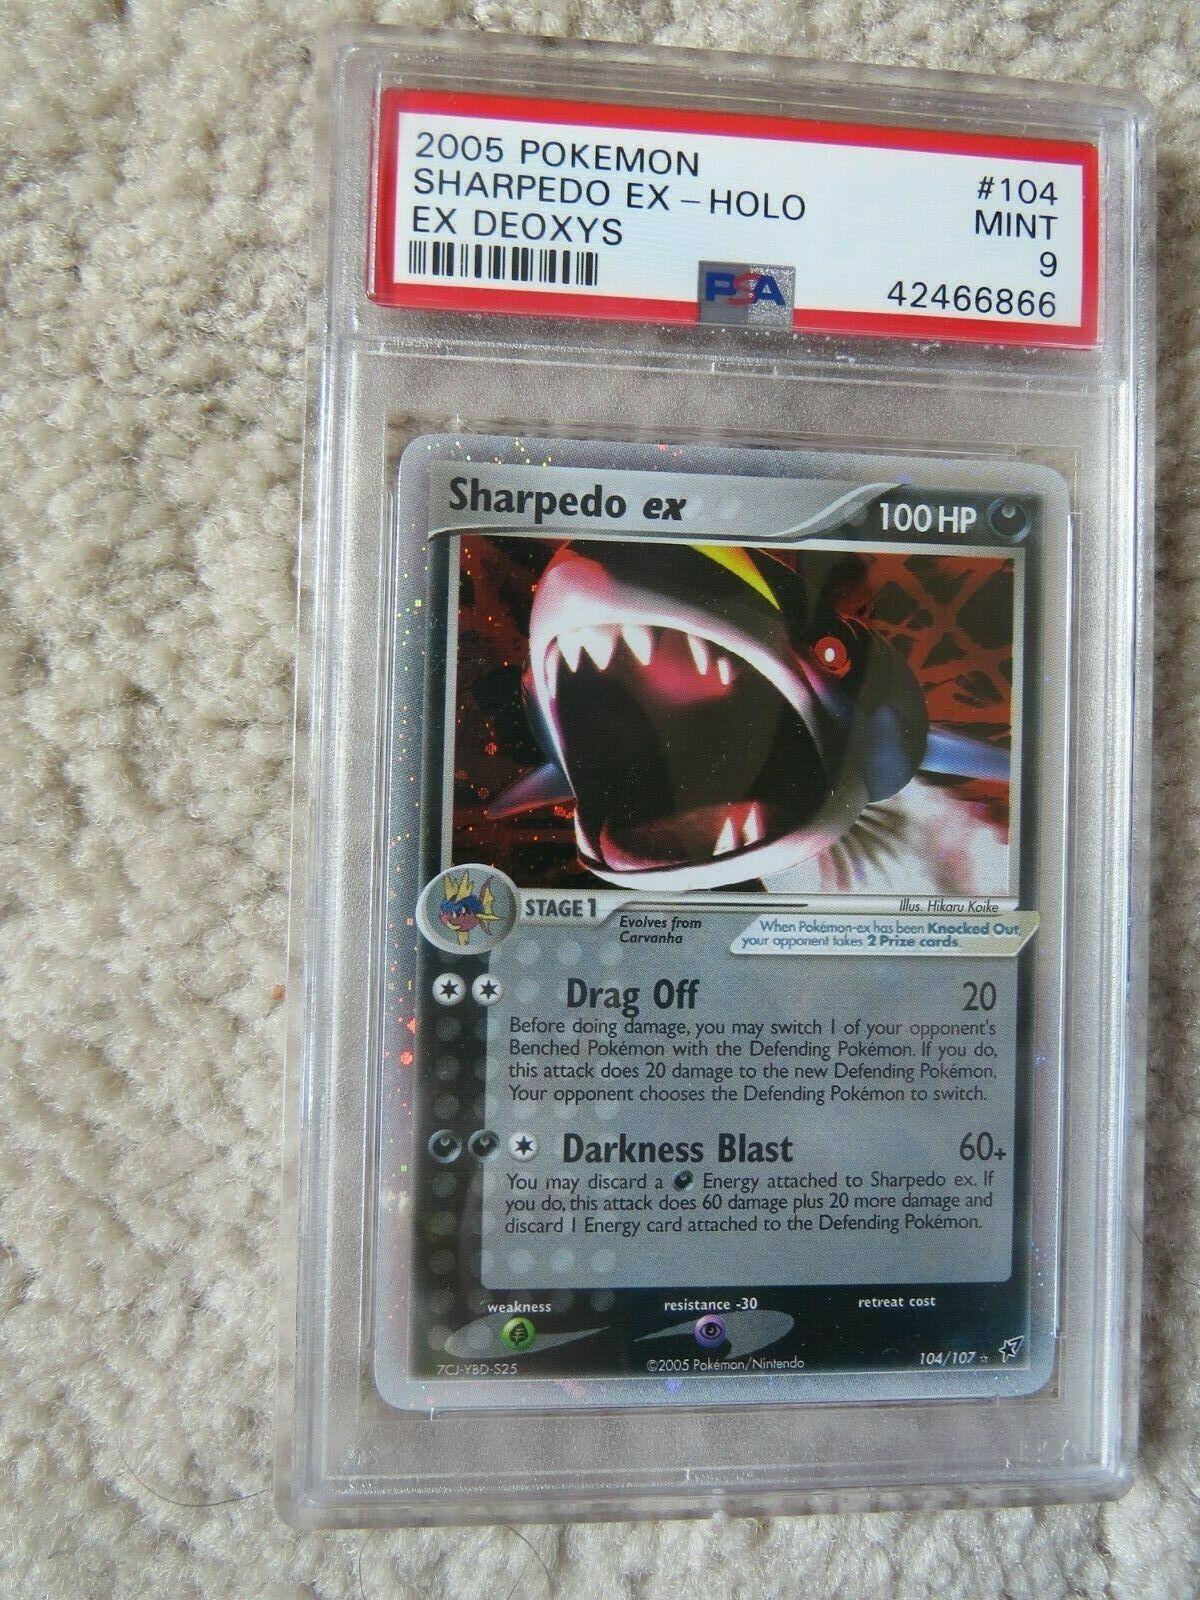 Pokemon Card  Ex Deoxys  104 Sharpedo ex PSA 9 Mint